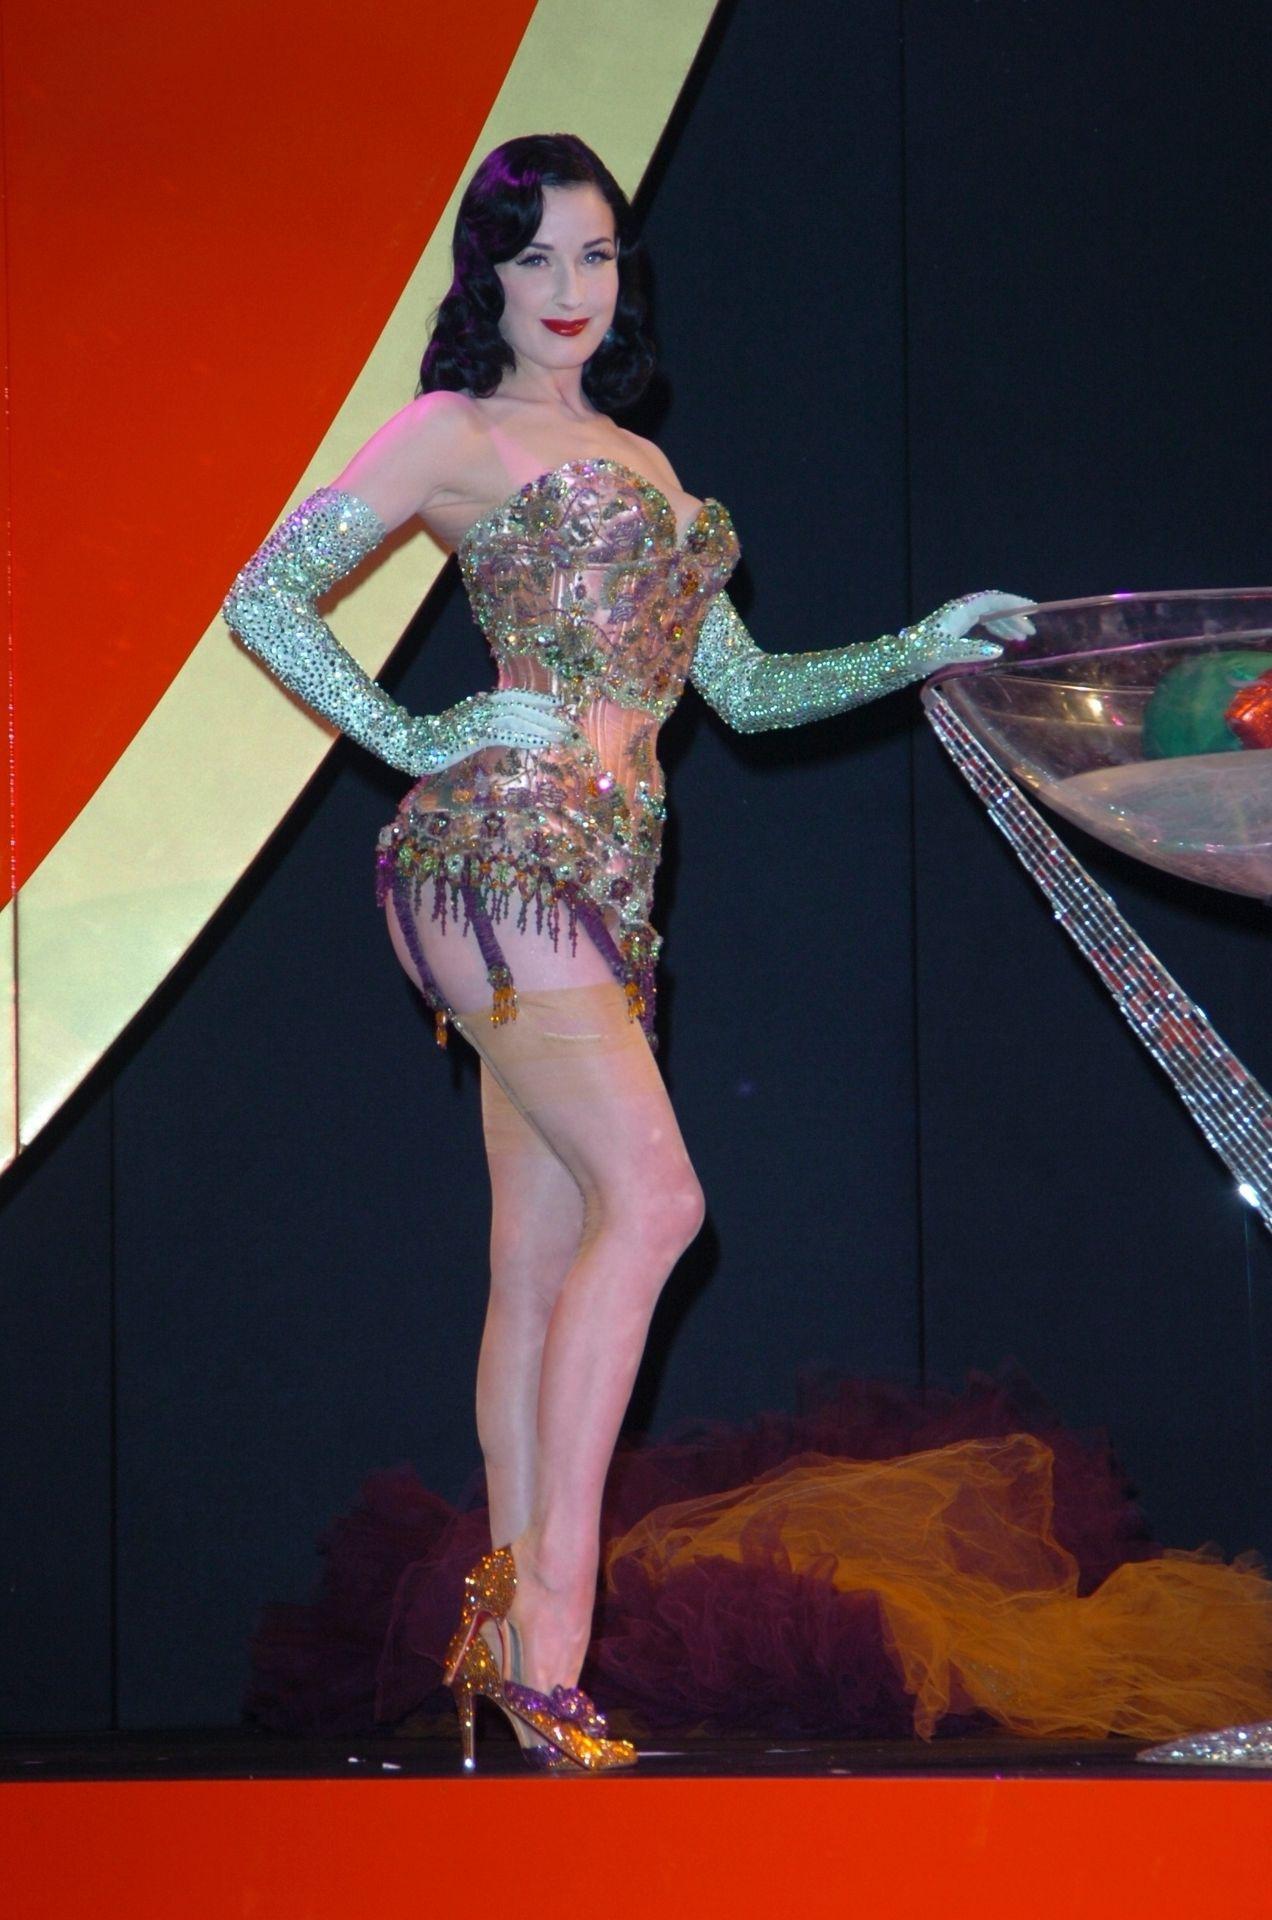 Dita Von Teese Performs At Erotica 06 In London 0017